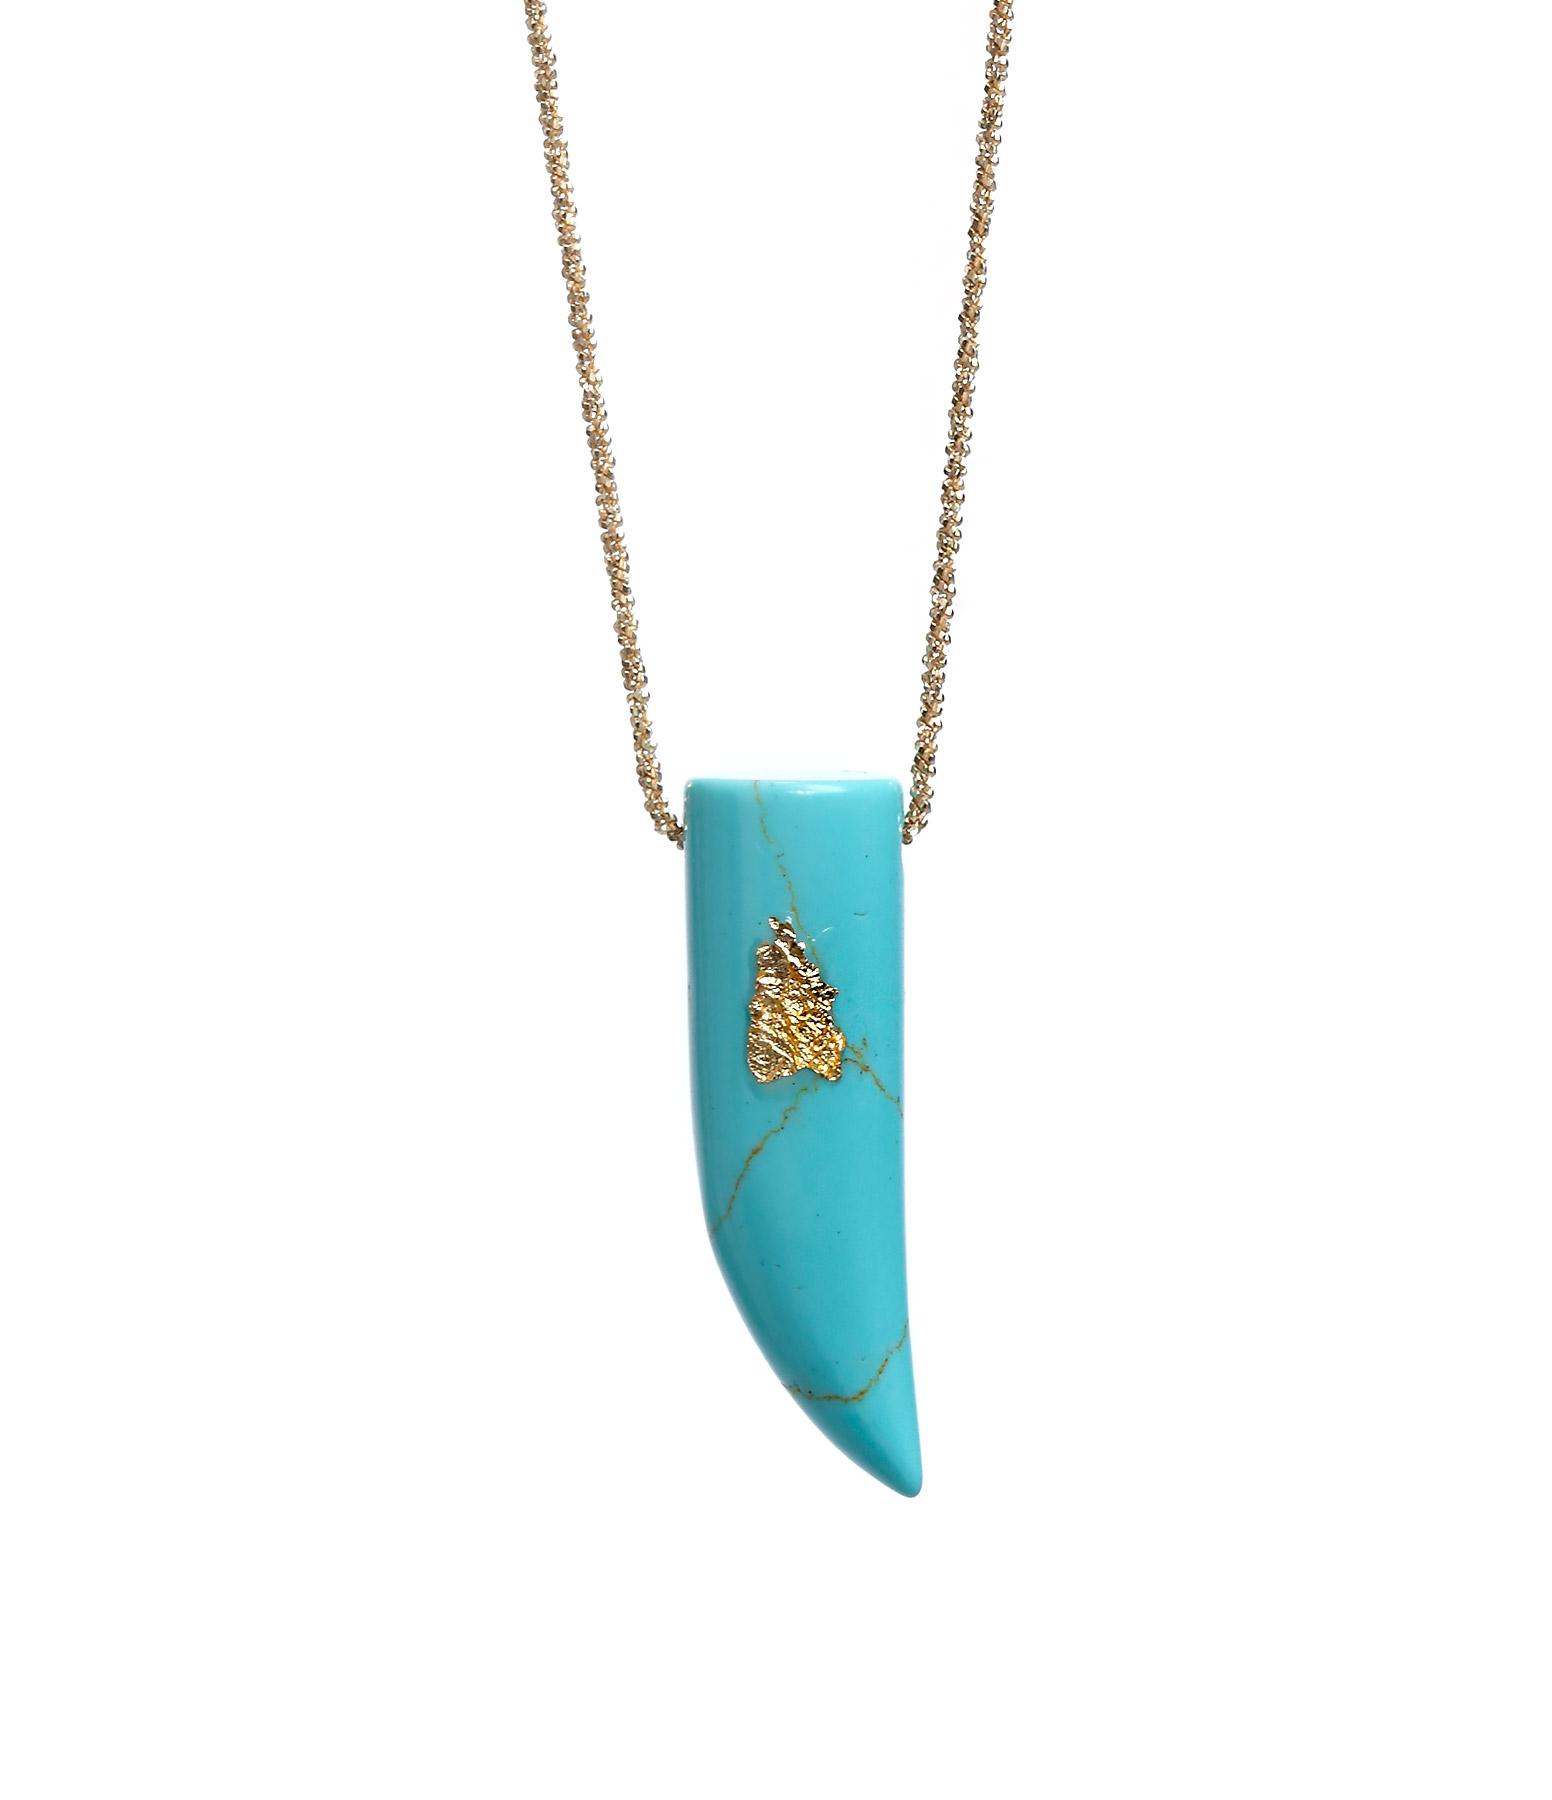 Sautoir Chaîne Corne XL Turquoise